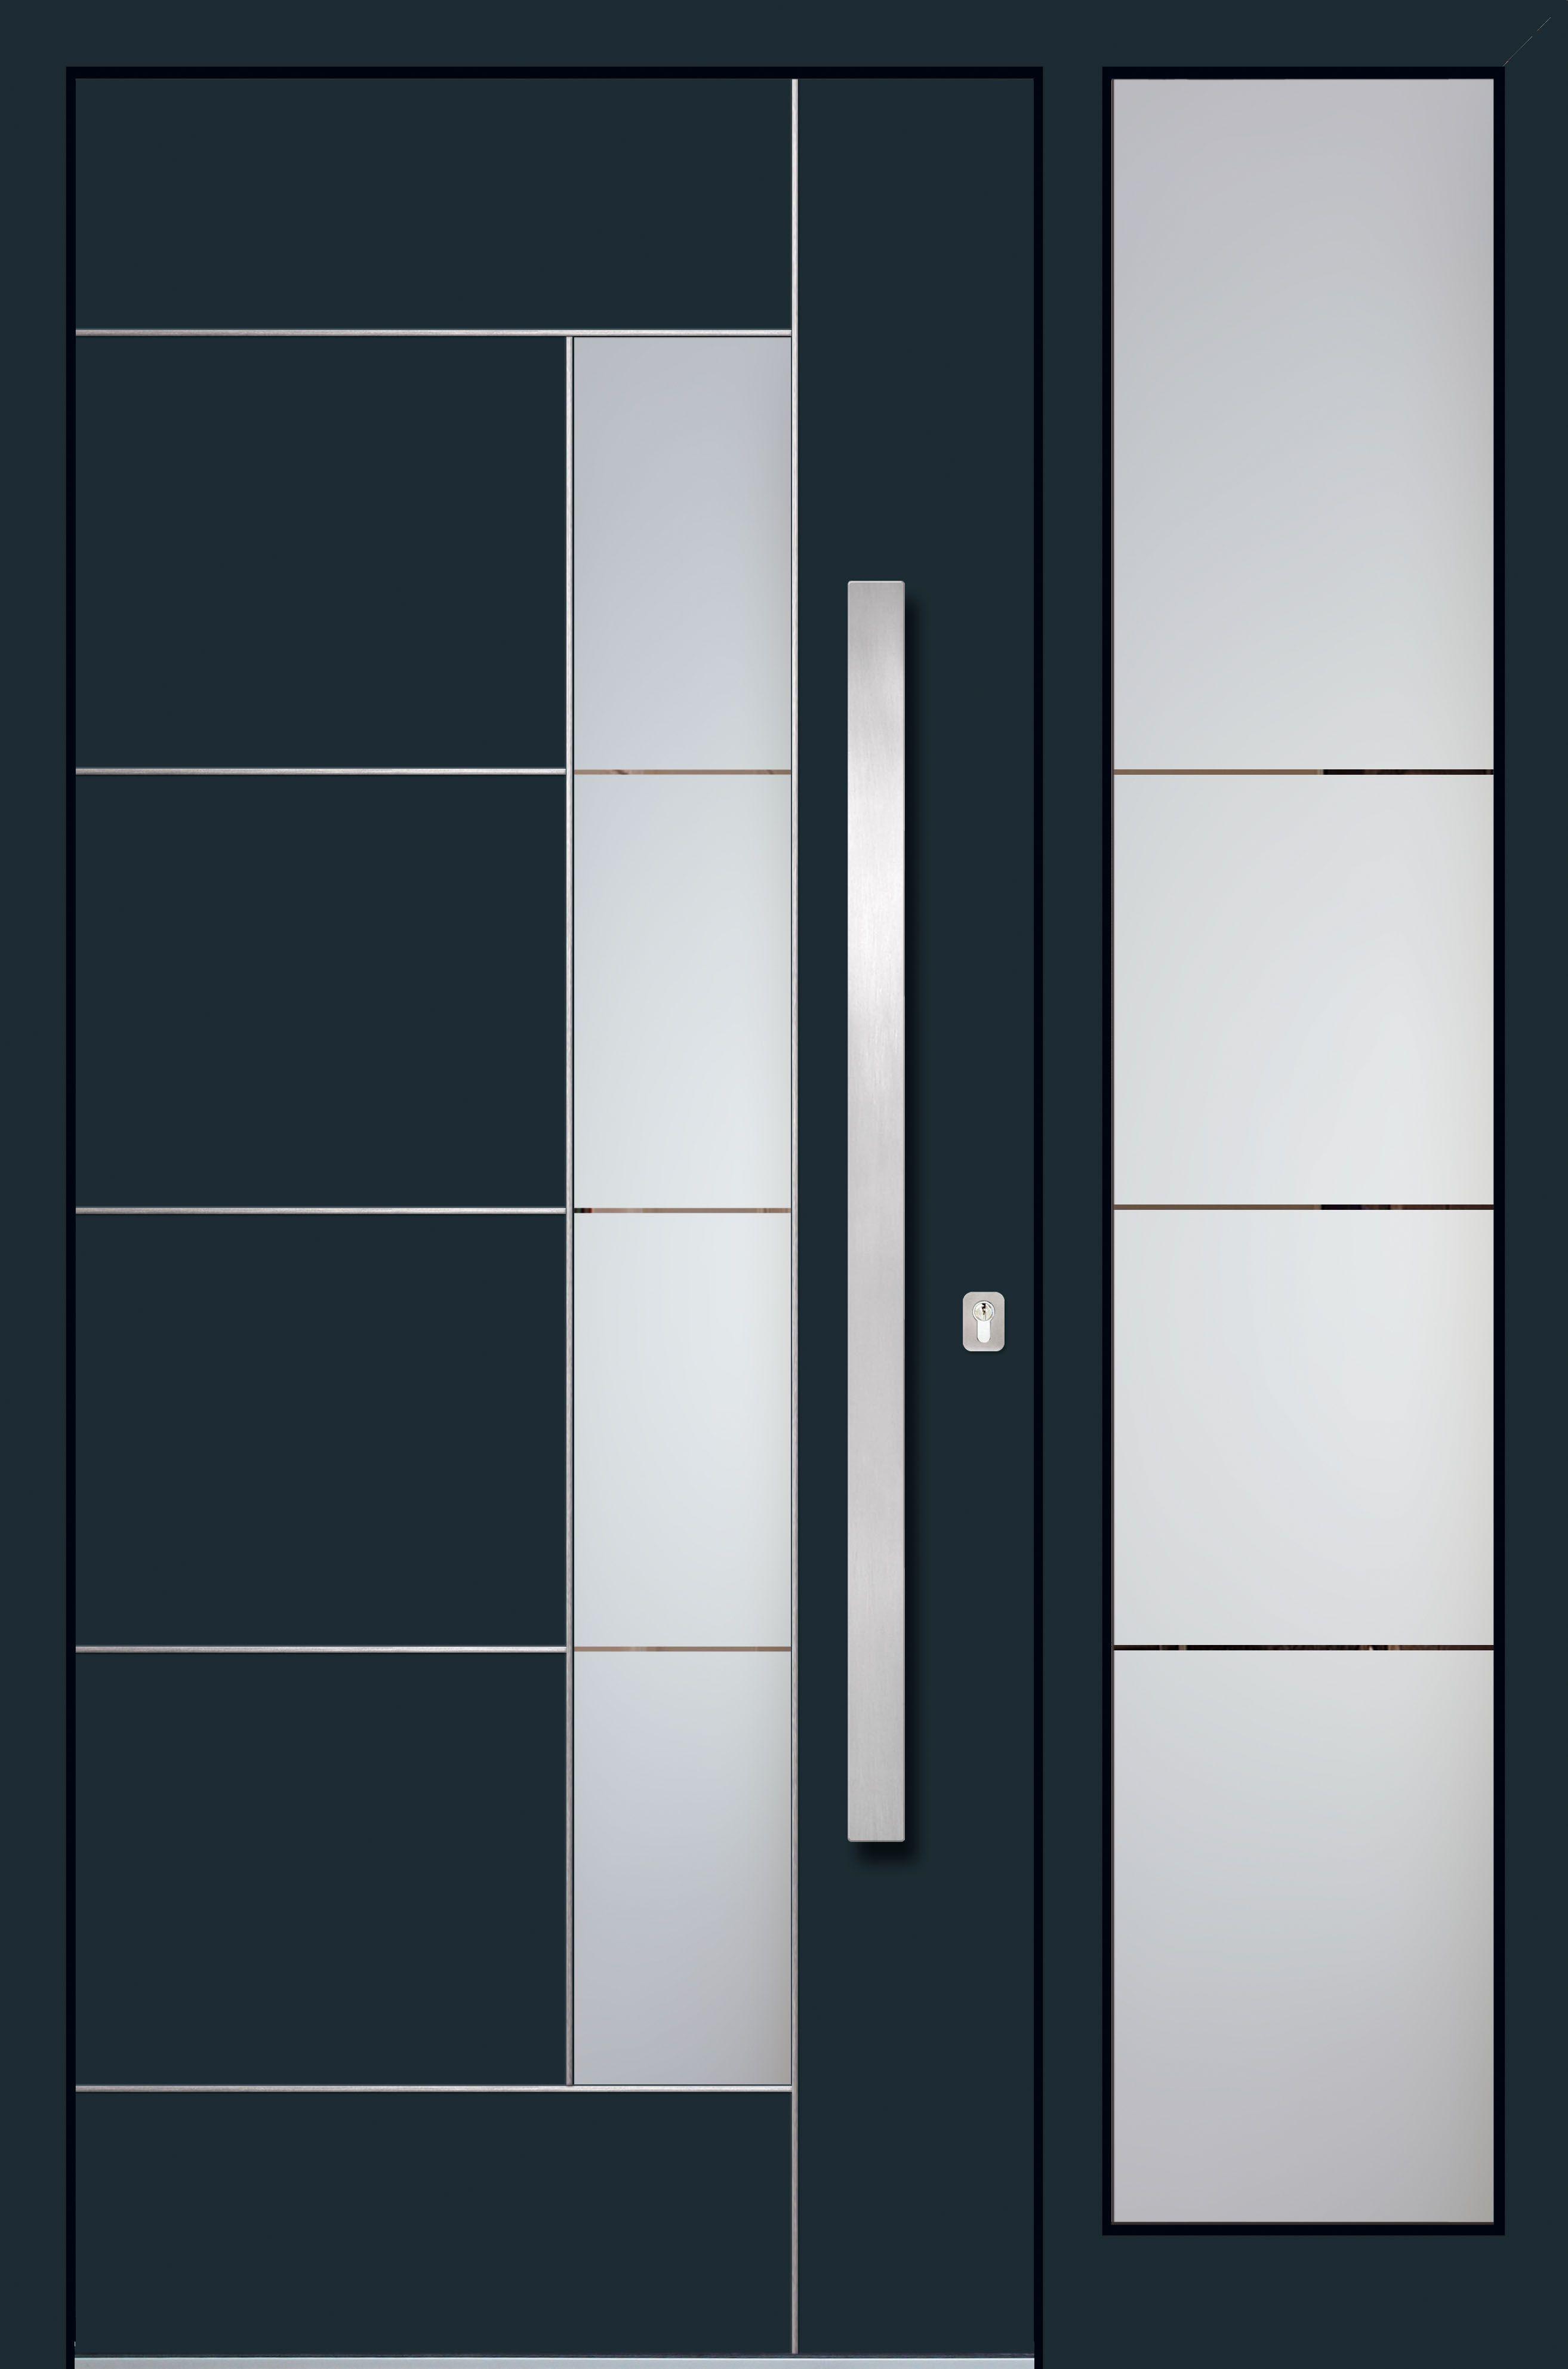 Alu Haustüren Schüco mit Seitenteil   Haustüren Aluminium Modern ...